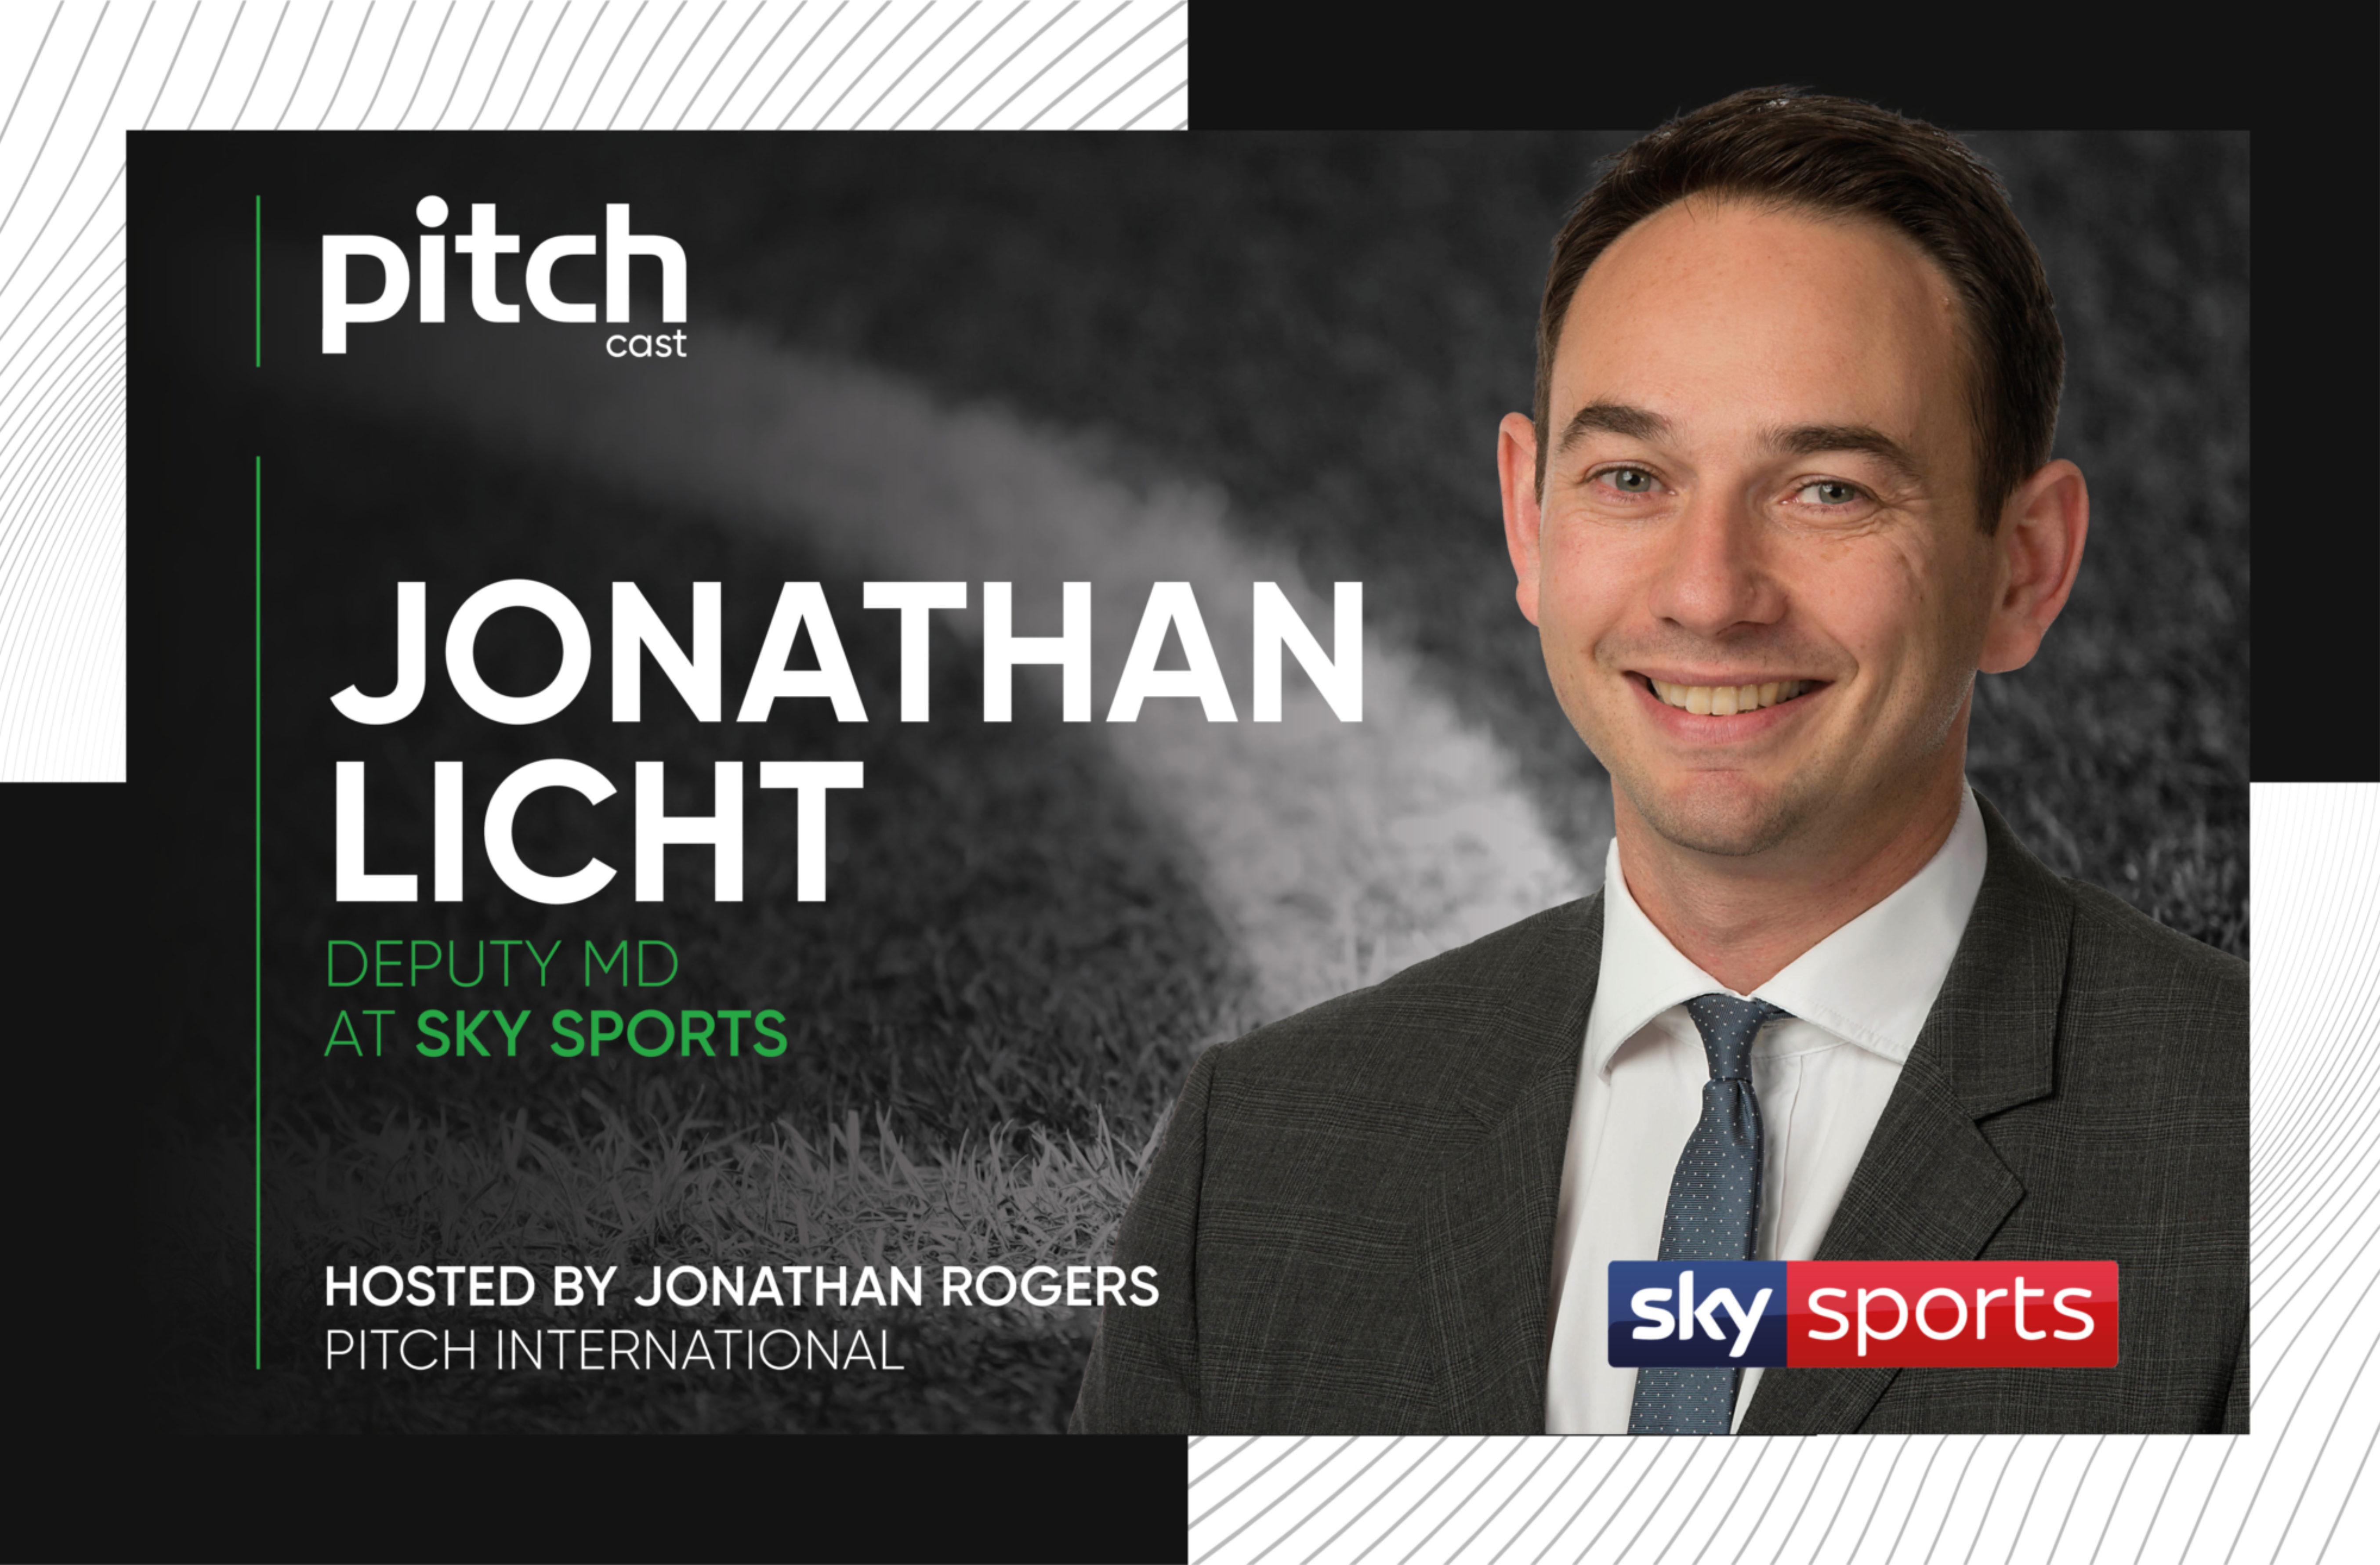 Pitch cast Jonathan Licht